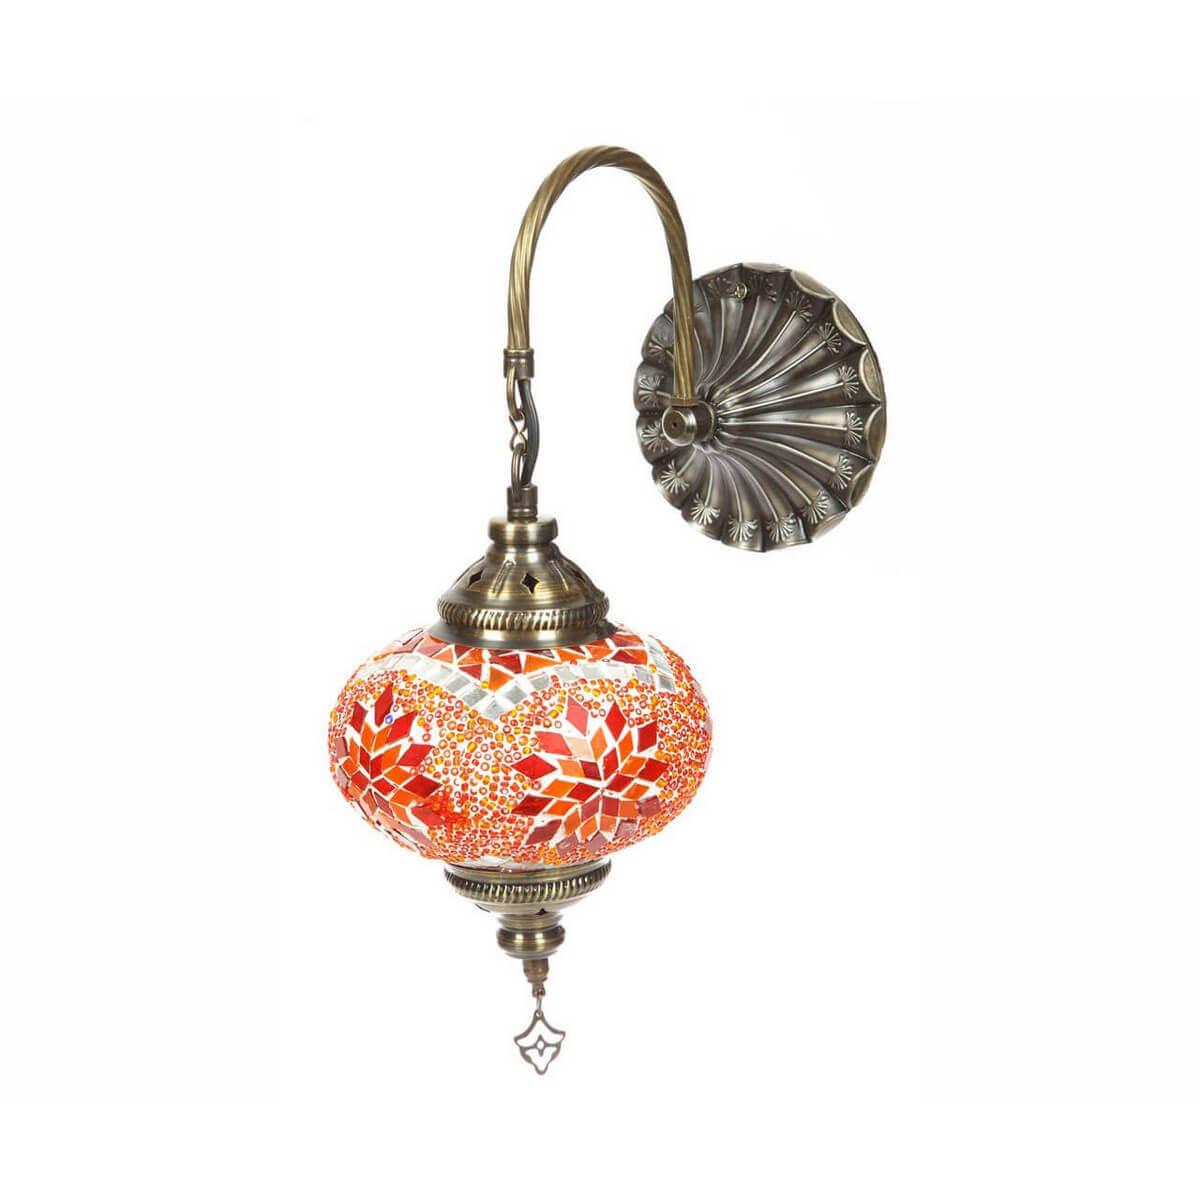 цена Бра Kink Light Марокко 0815T,09 в интернет-магазинах